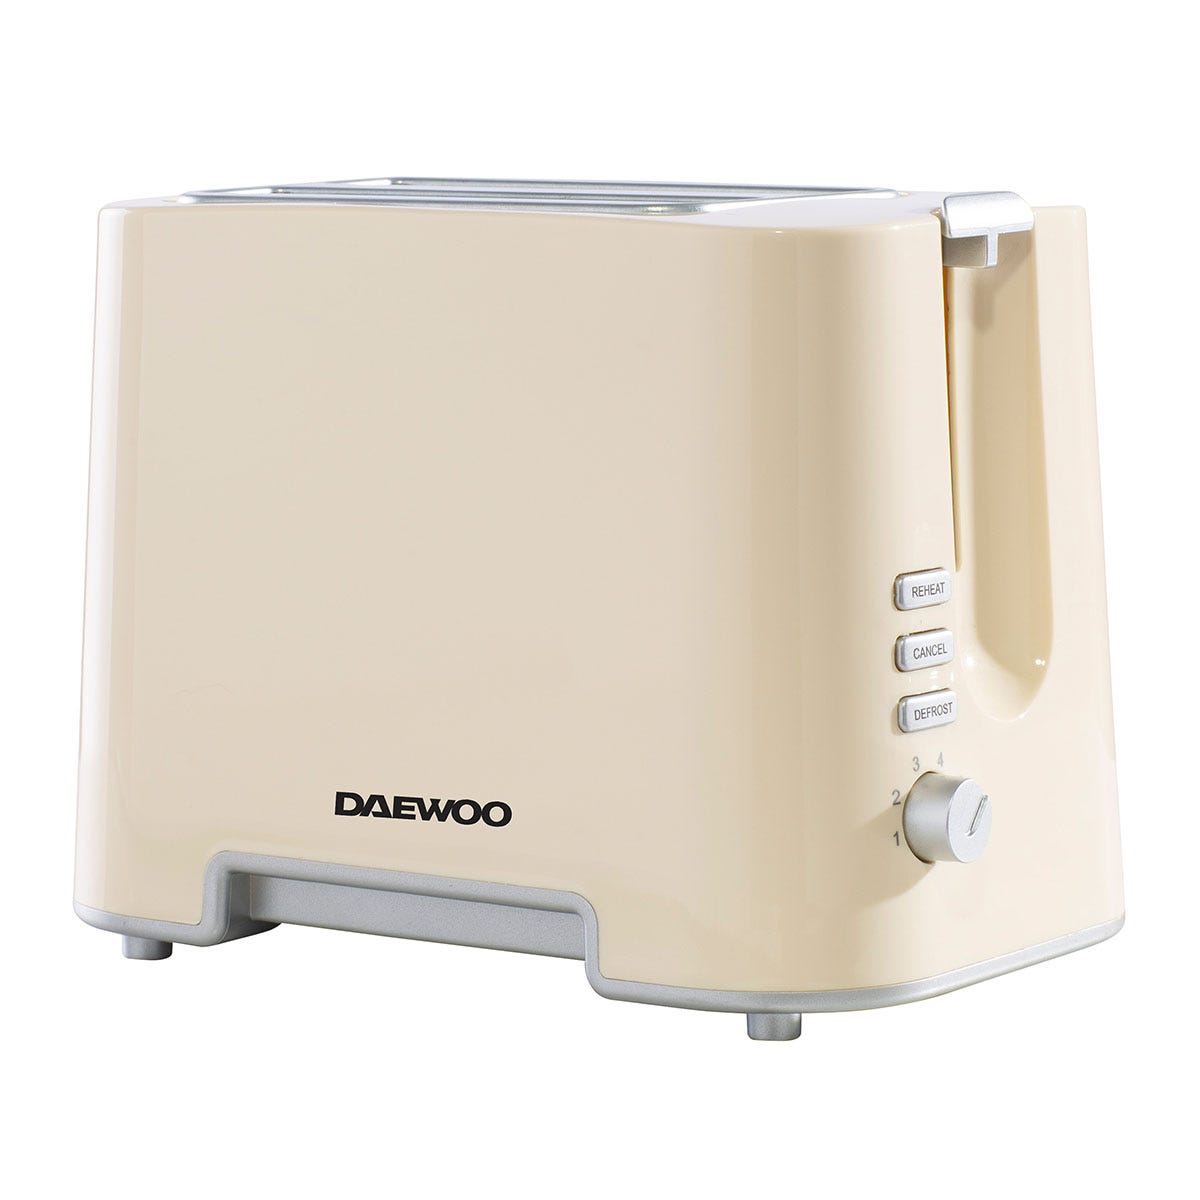 Daewoo SDA1688 870W 2-Slice Plastic Toaster - Cream with Chrome Band